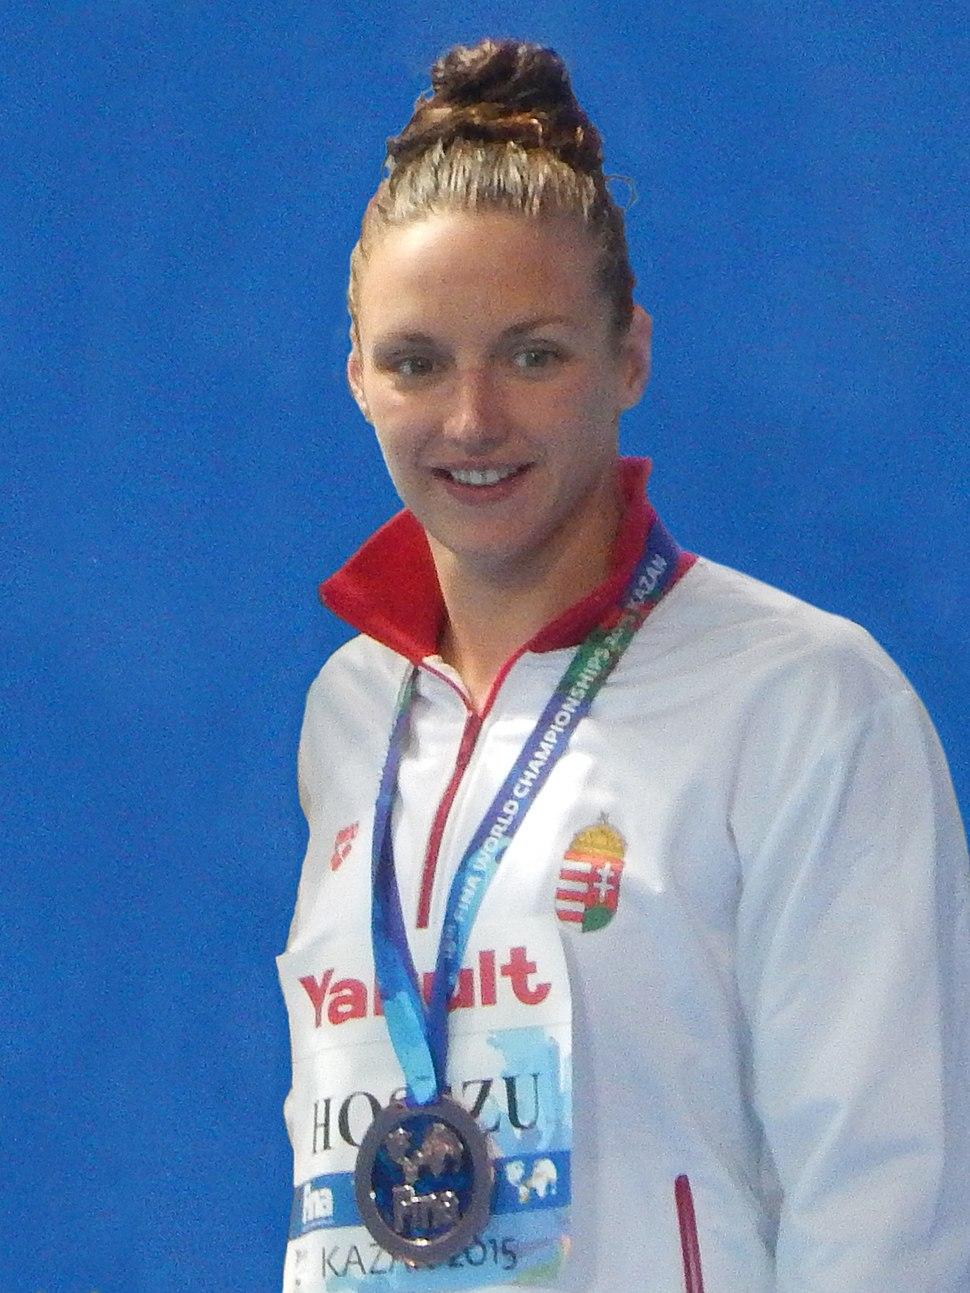 Kazan 2015 - Hosszú Katinka 200m backstroke